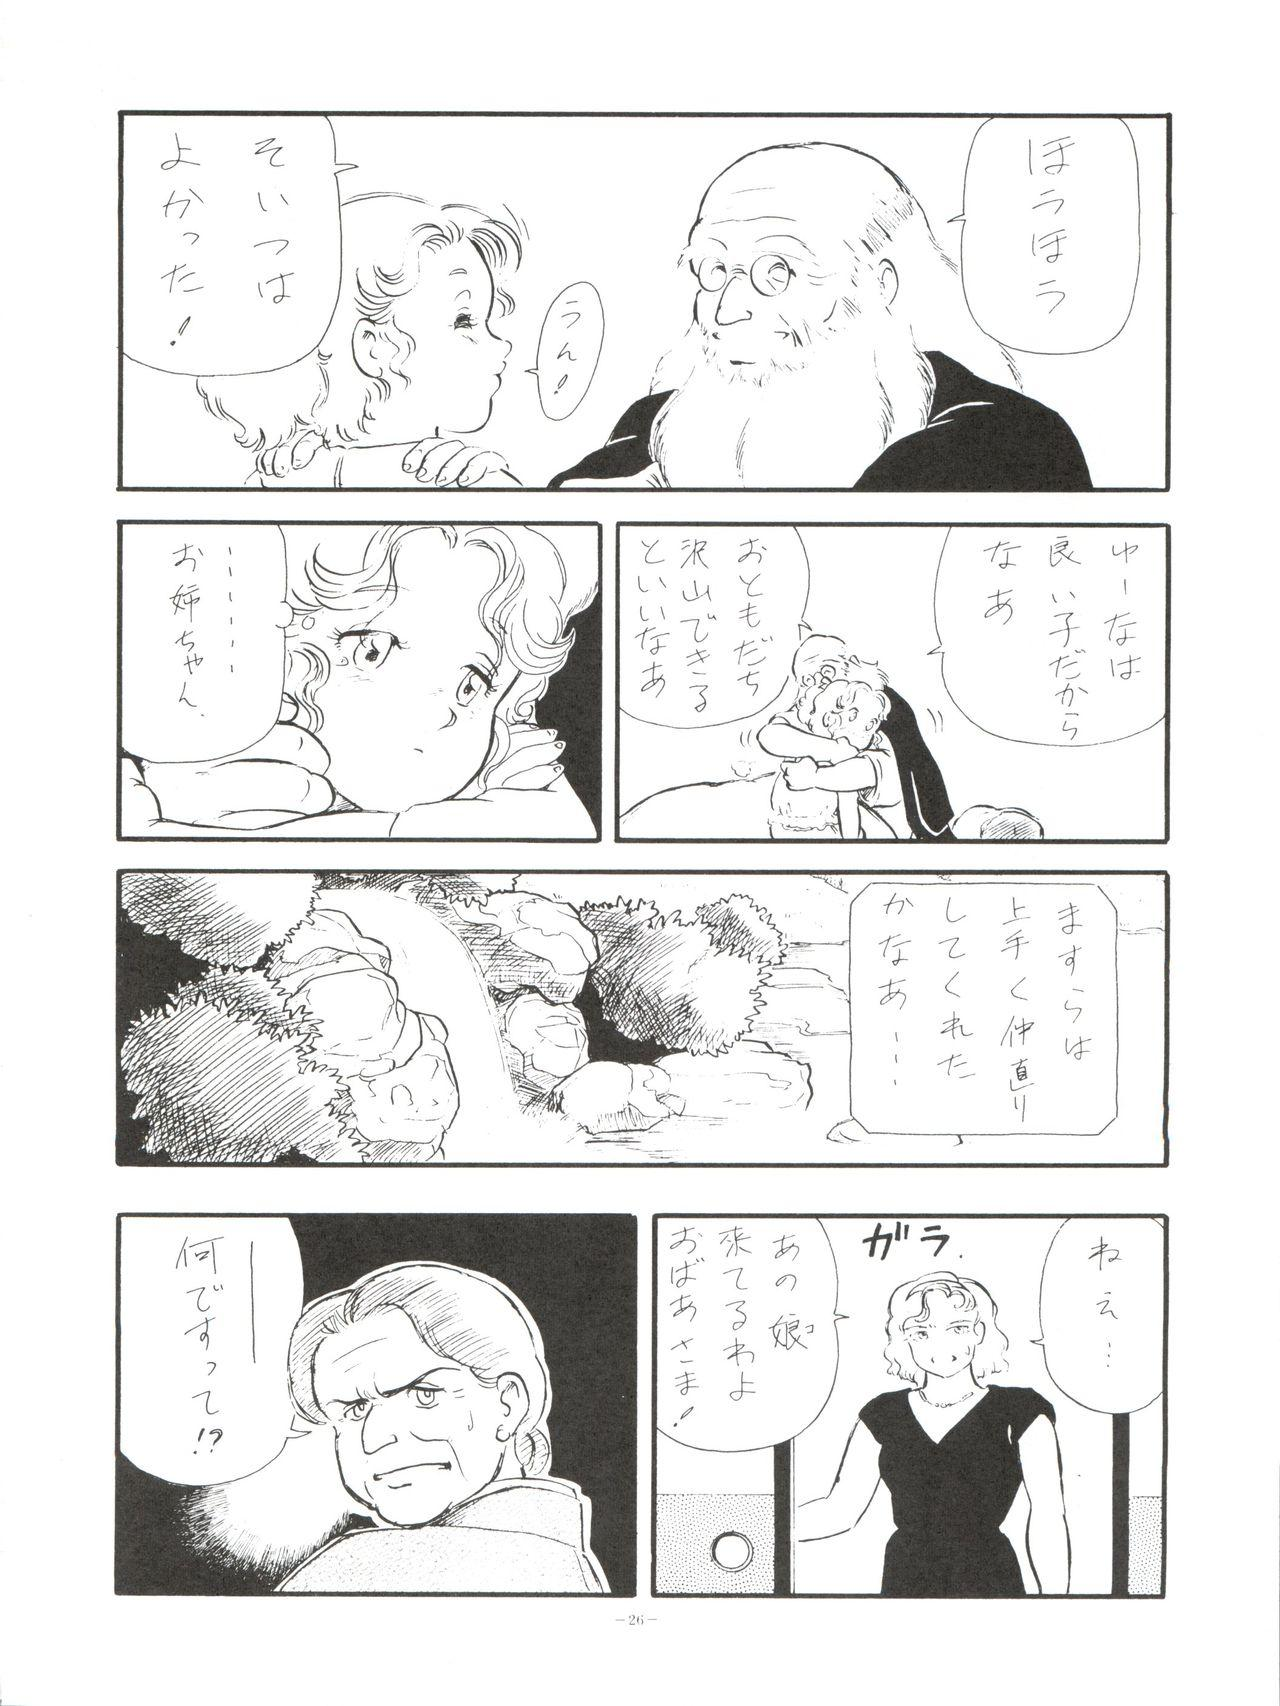 BLOOMAGAZINE Vol. 4 25